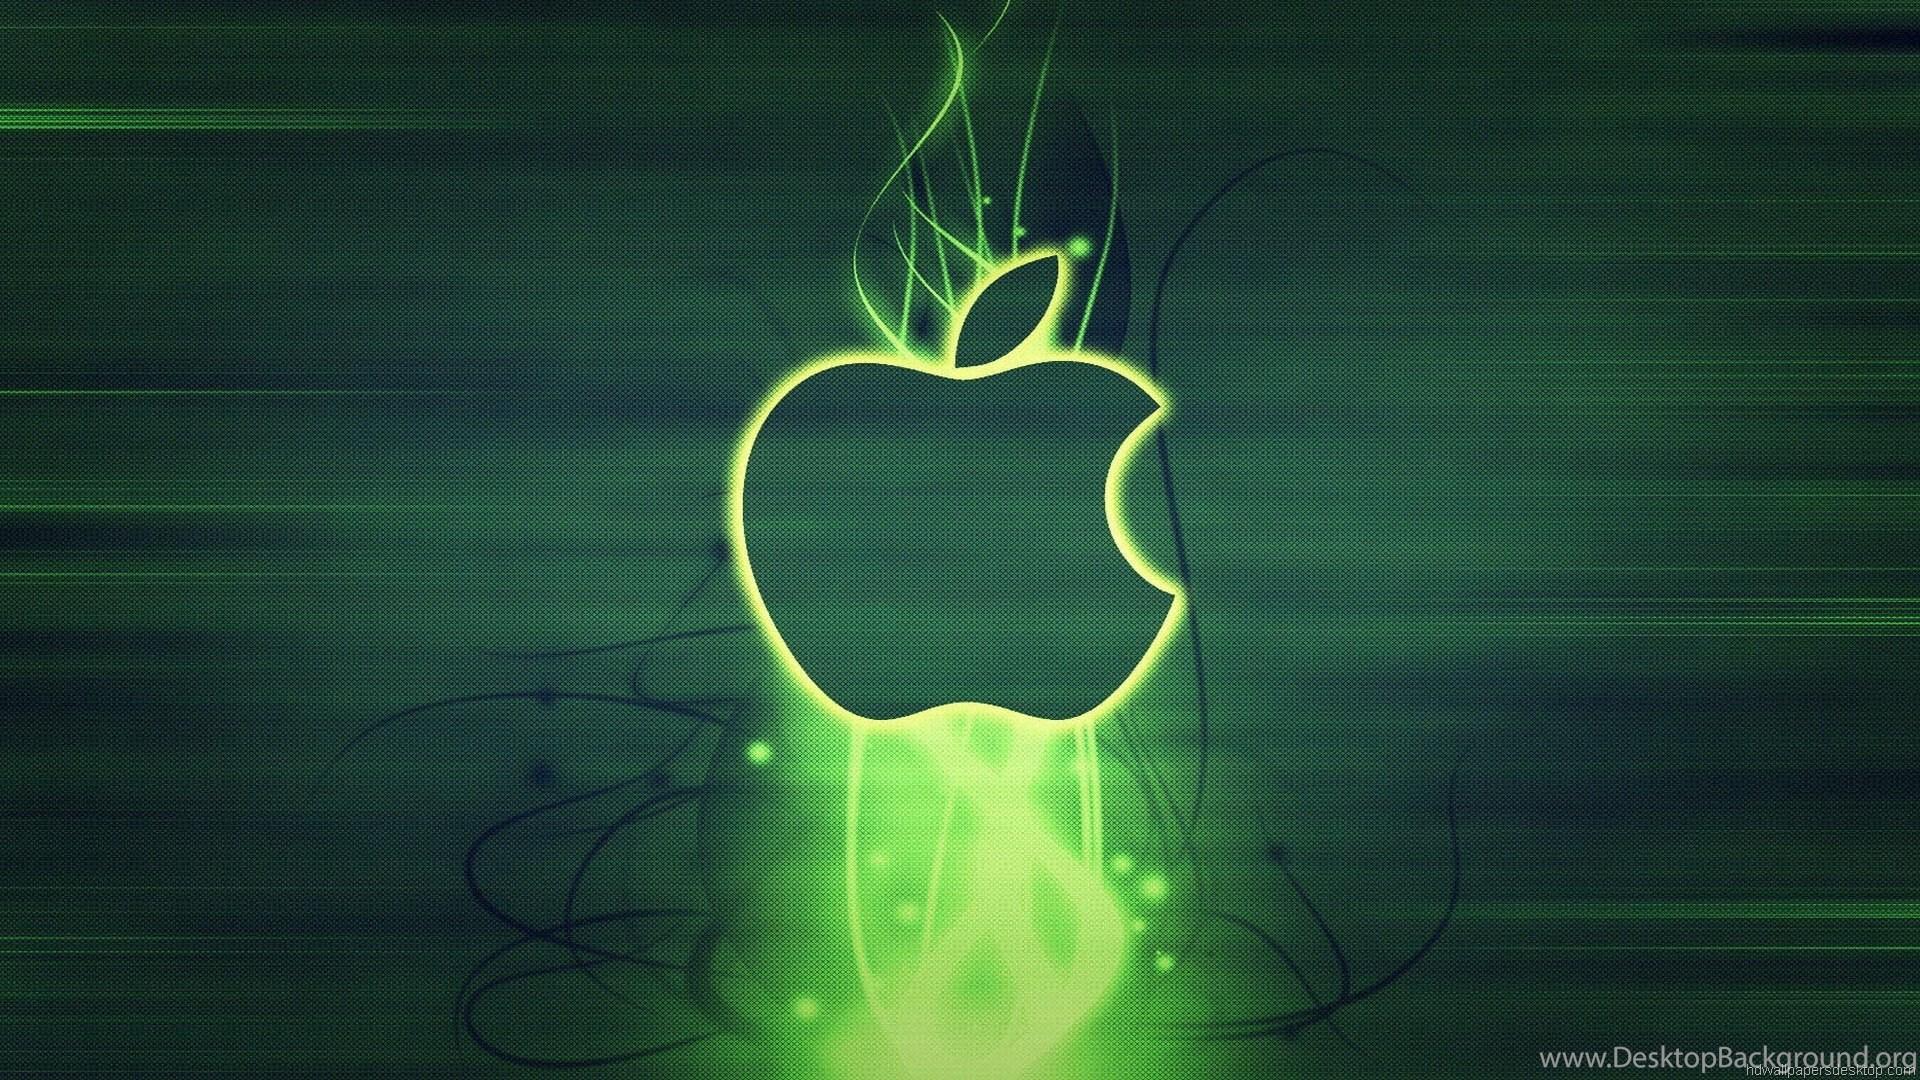 Apple Wallpapers Full Hd 1080p Desktop Wallpapers Apple Wallpapers